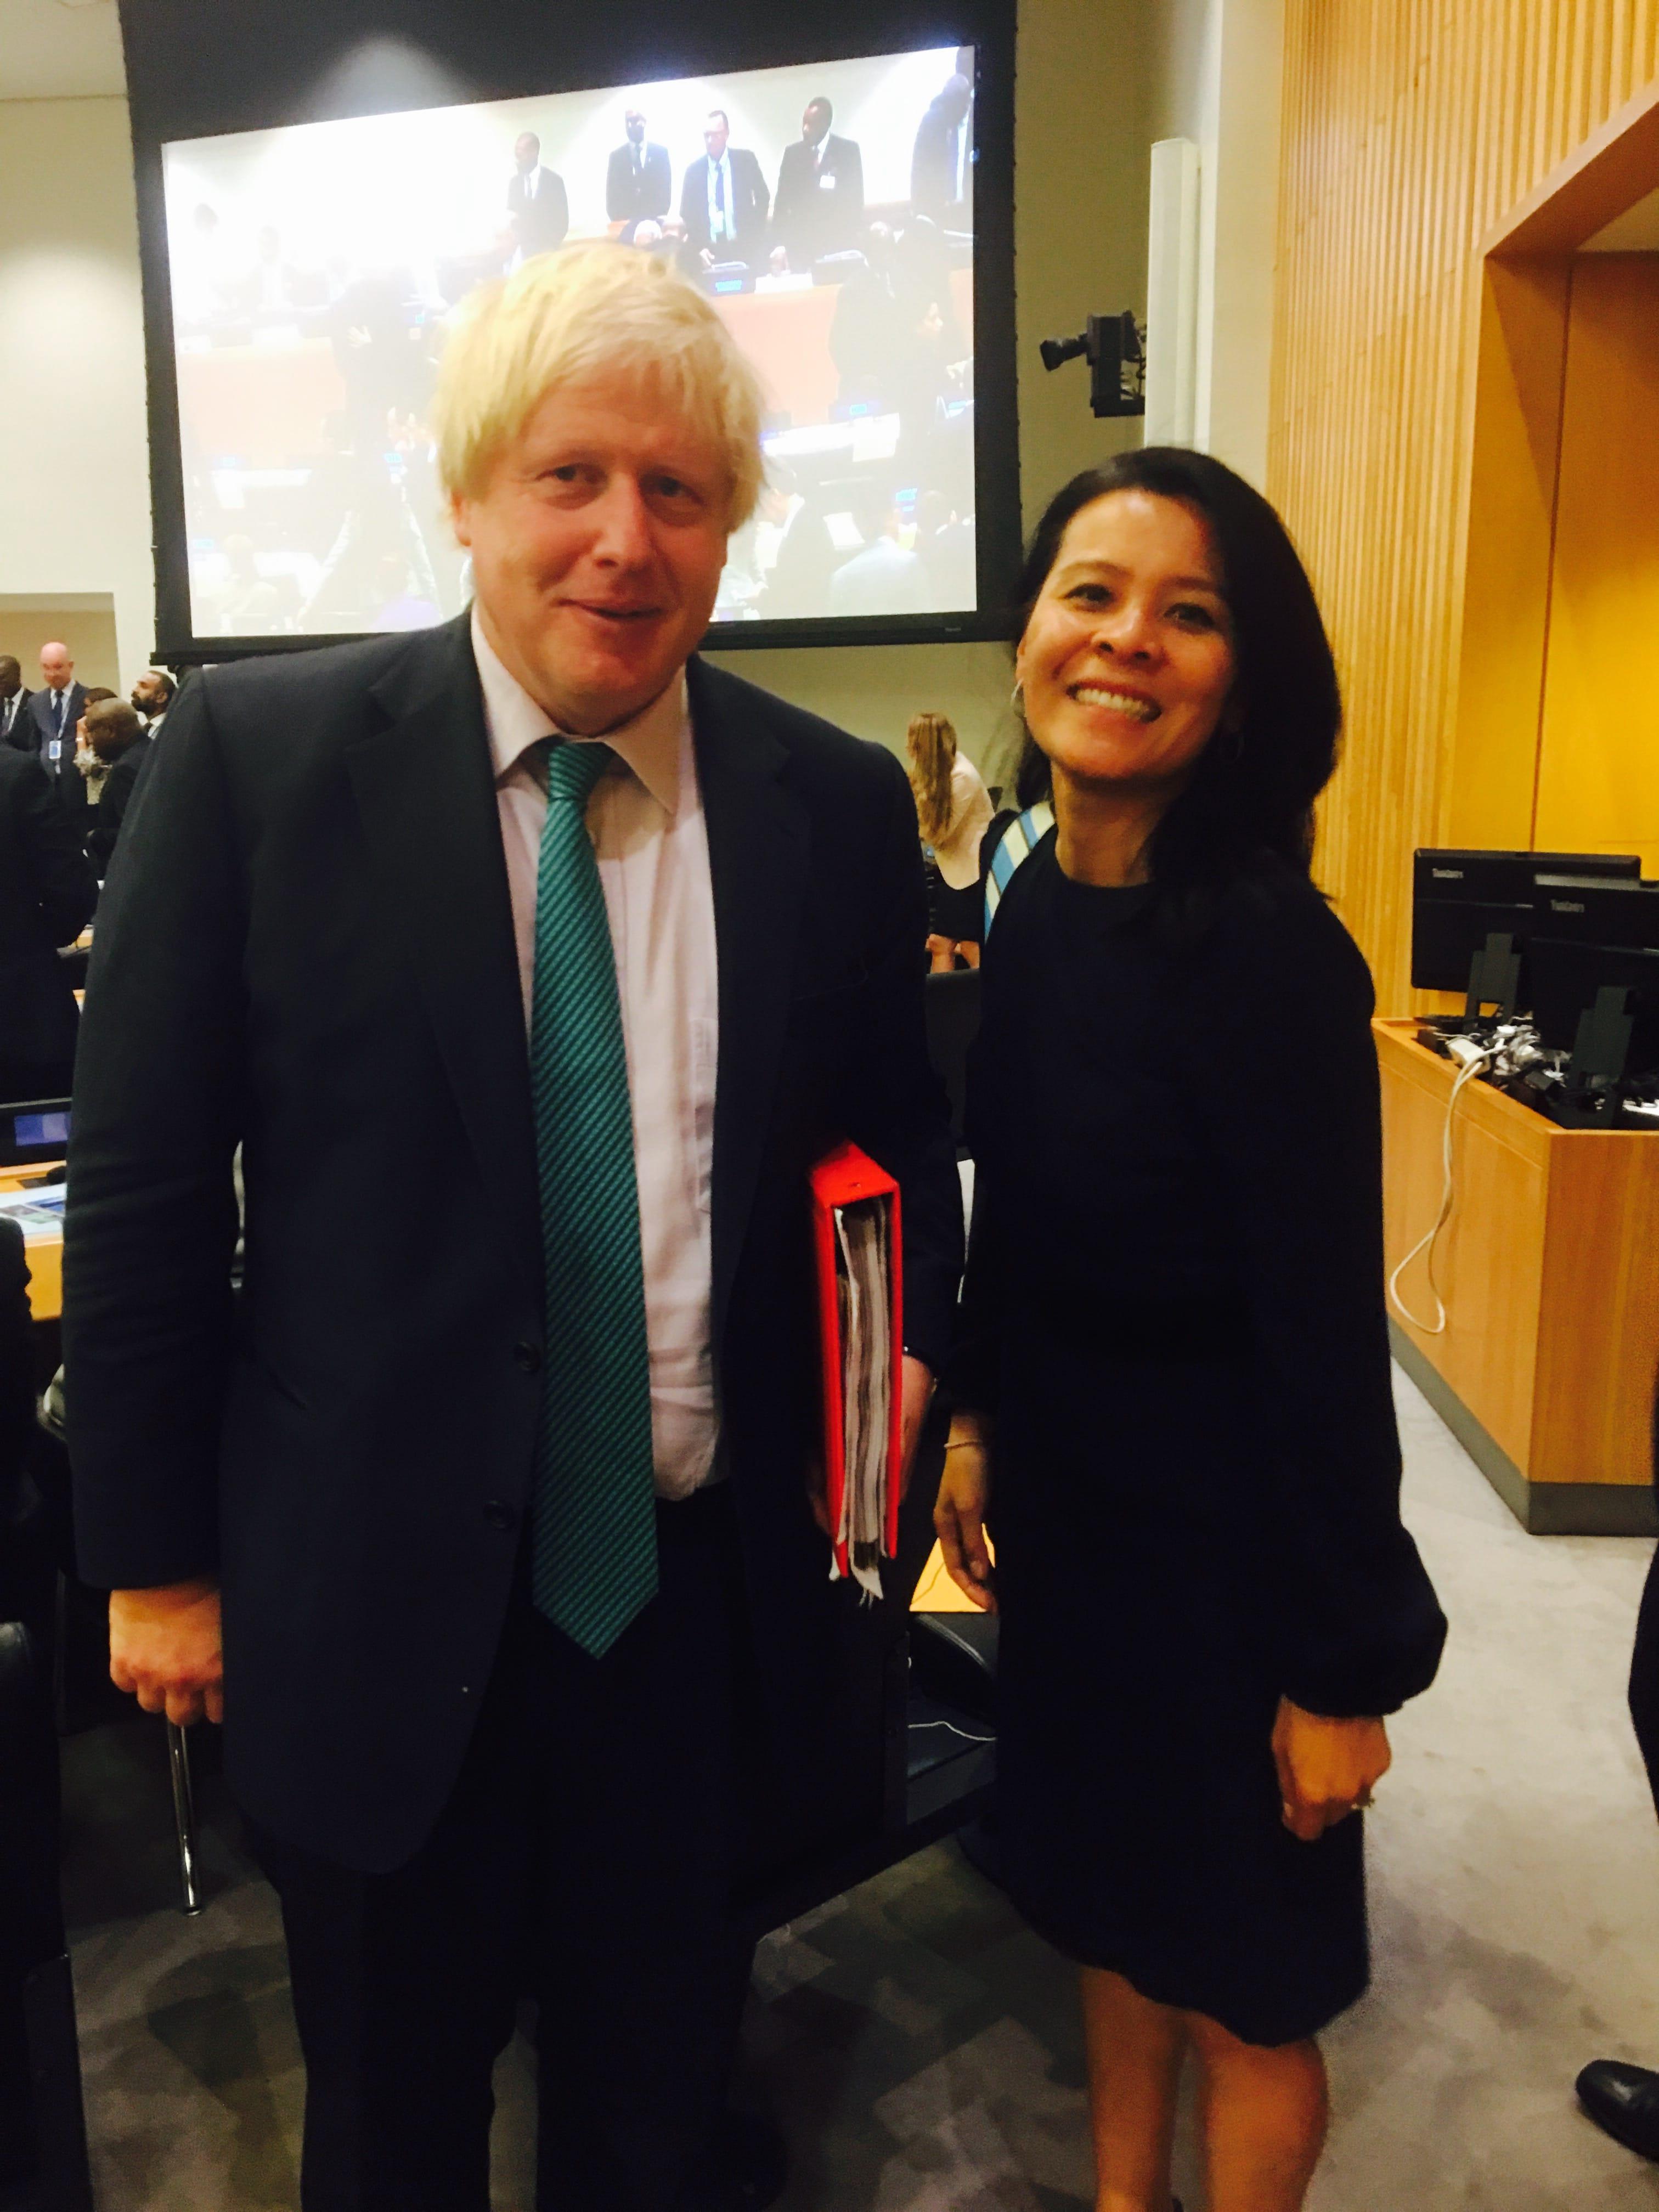 Boris Johnson, British Foreign Secretary, and Paksy Plackis-Cheng, founder impactmania at the United Nations, New York, NY 2017.